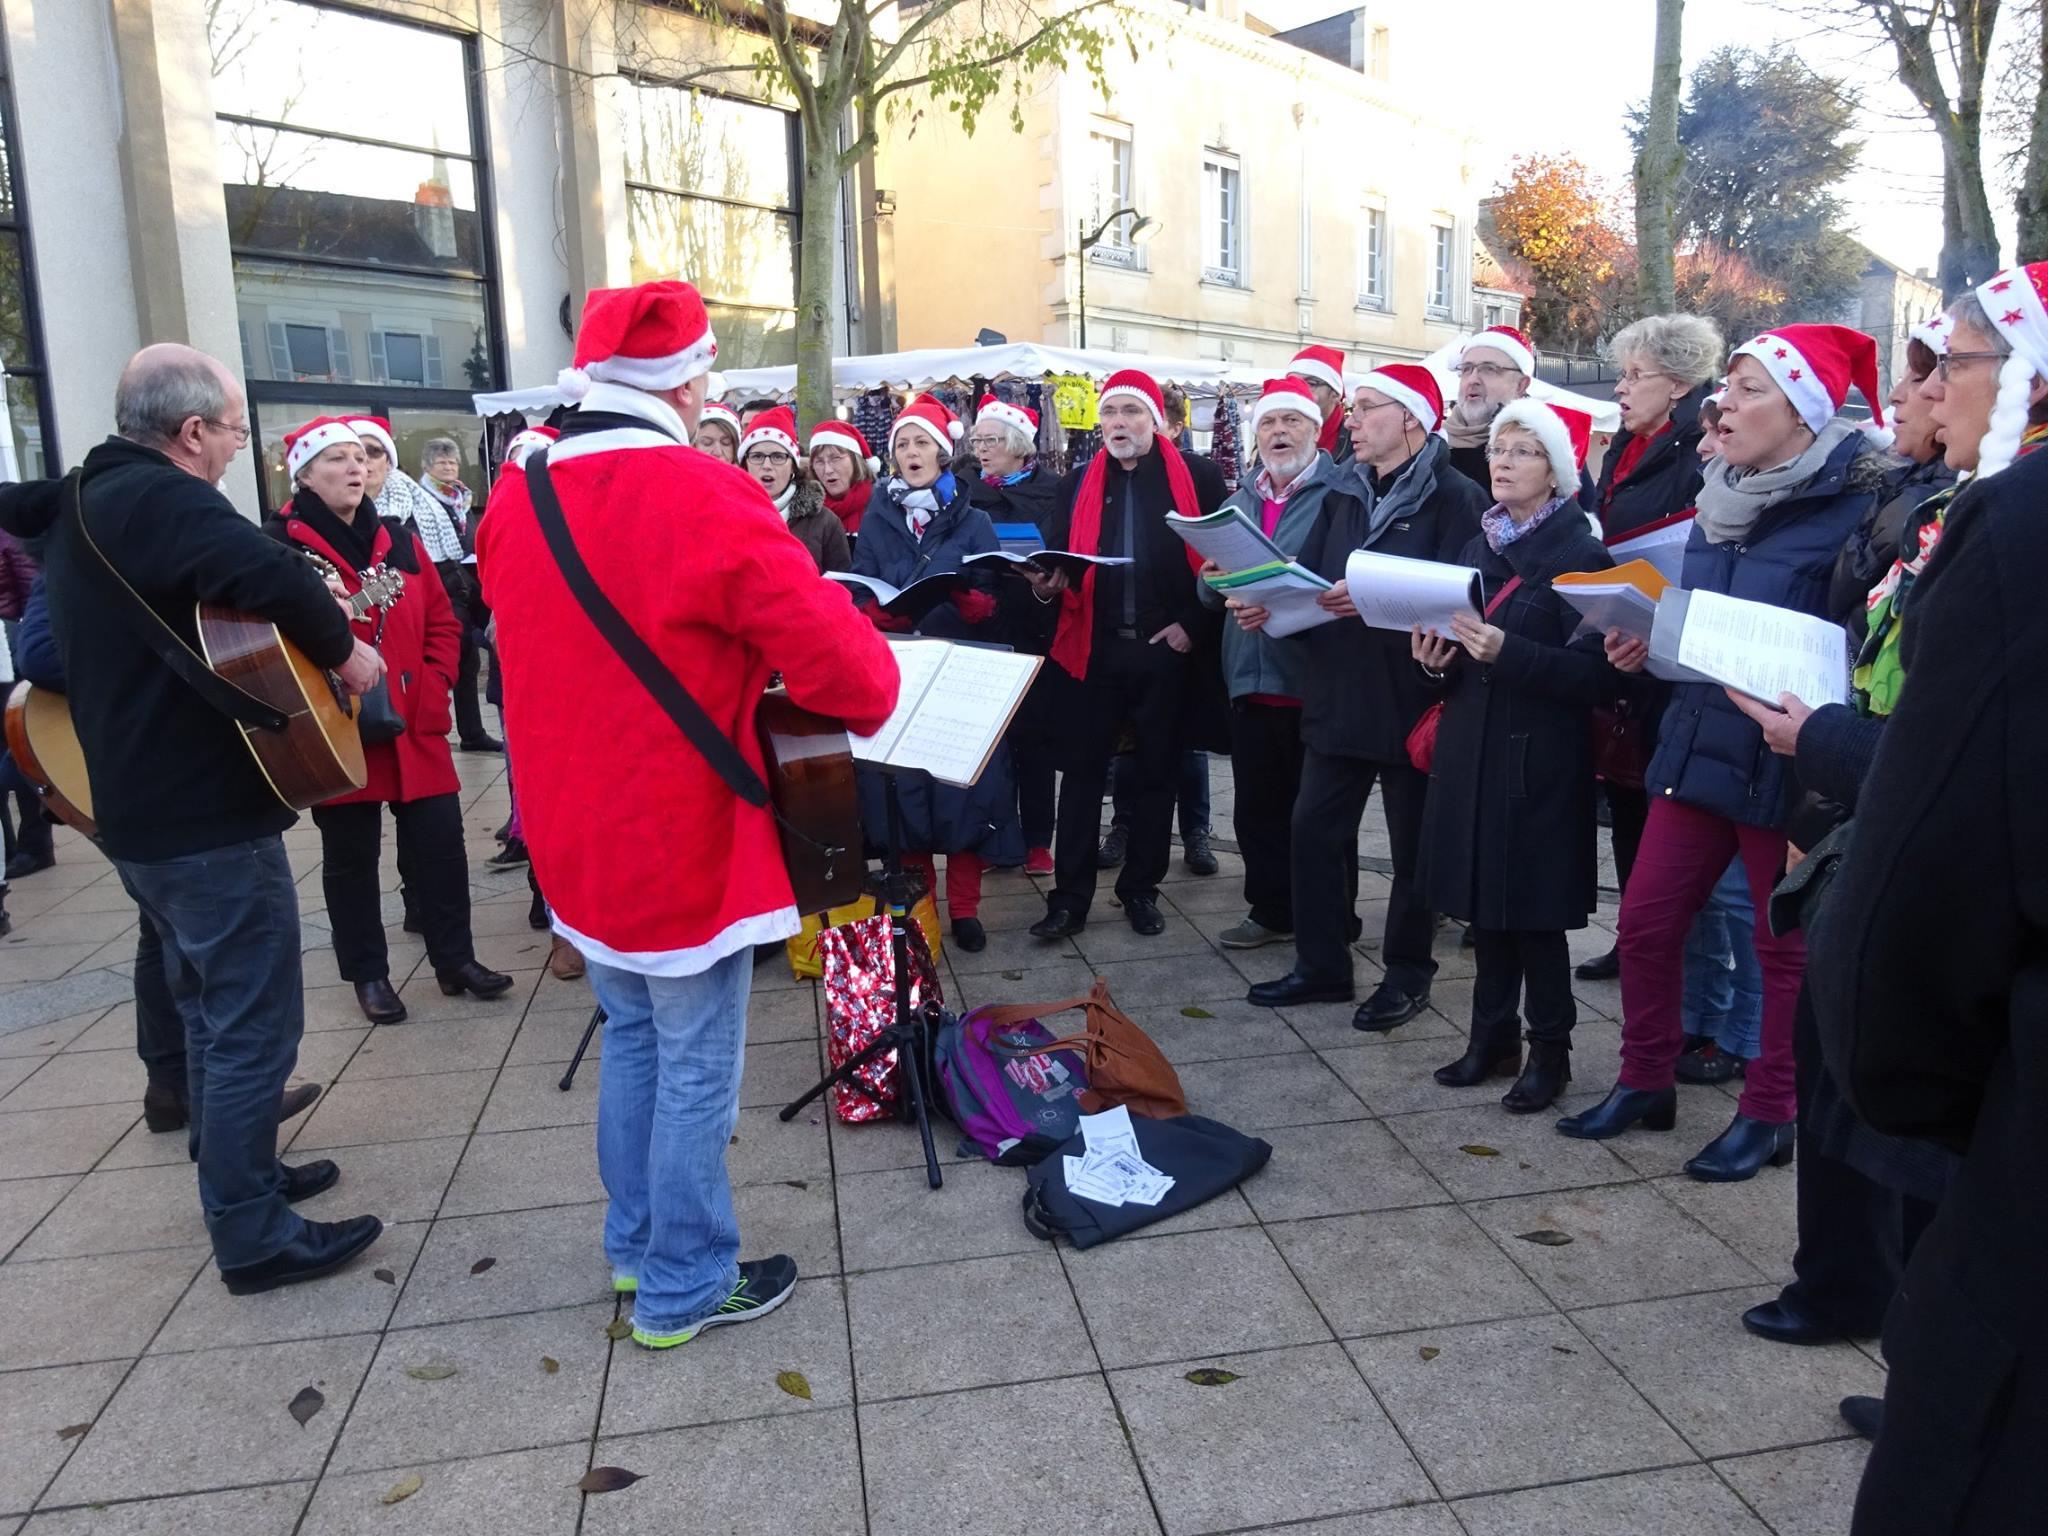 2015-12-12 – Au marché de Noël (5) Sabrina